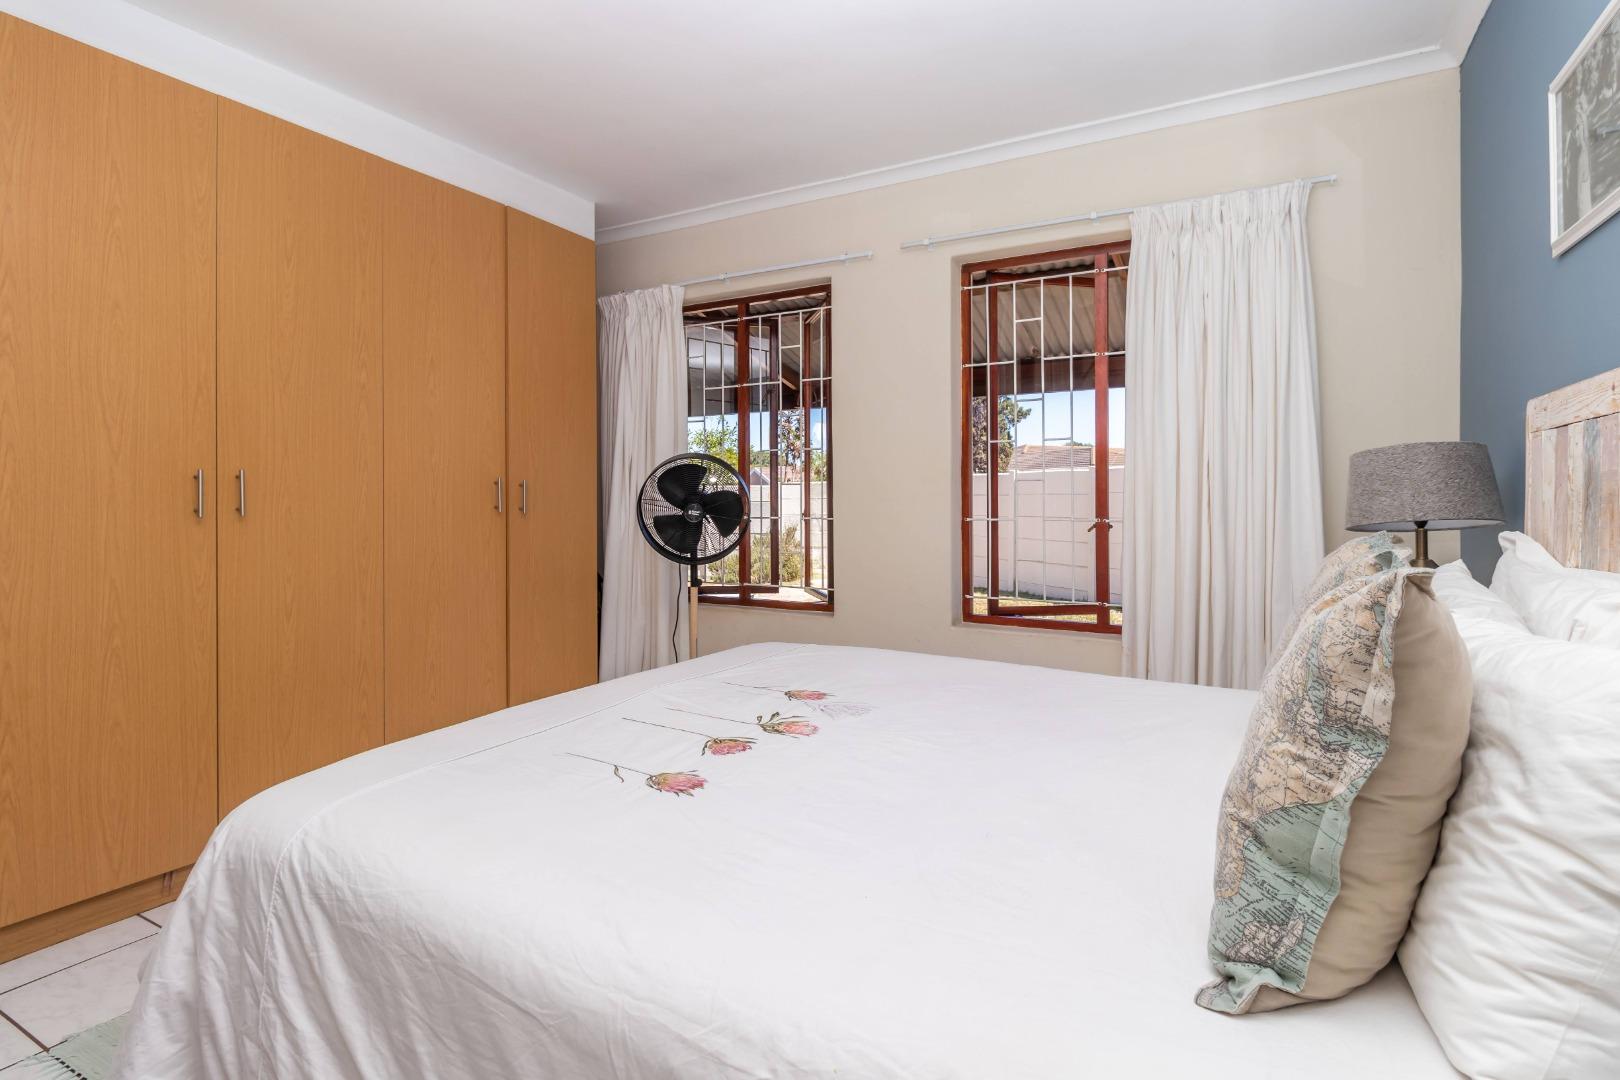 4 Bedroom House For Sale in Winelands